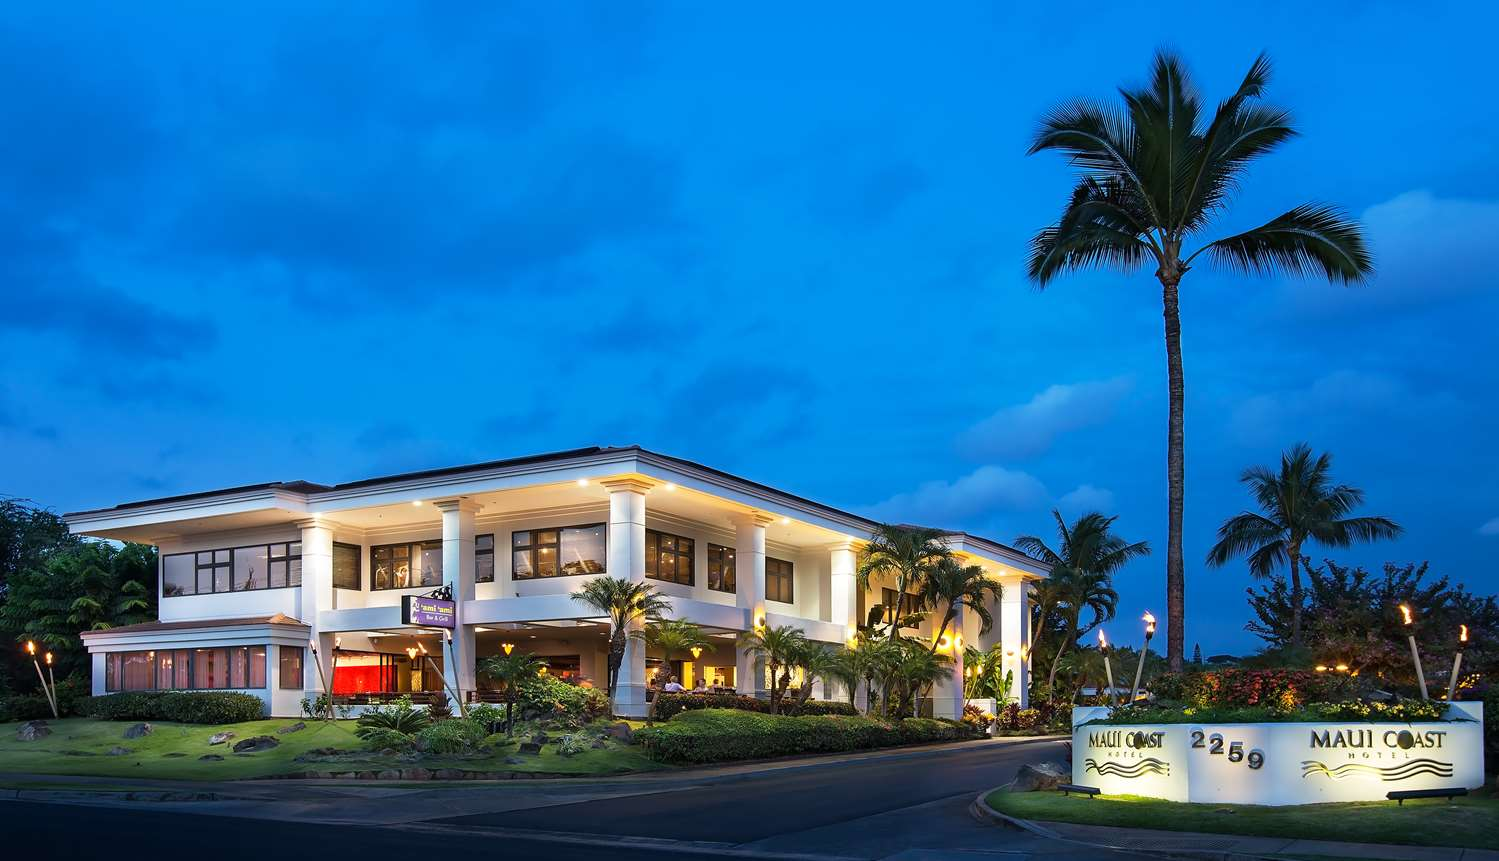 Exterior View Maui Coast Hotel Kihei